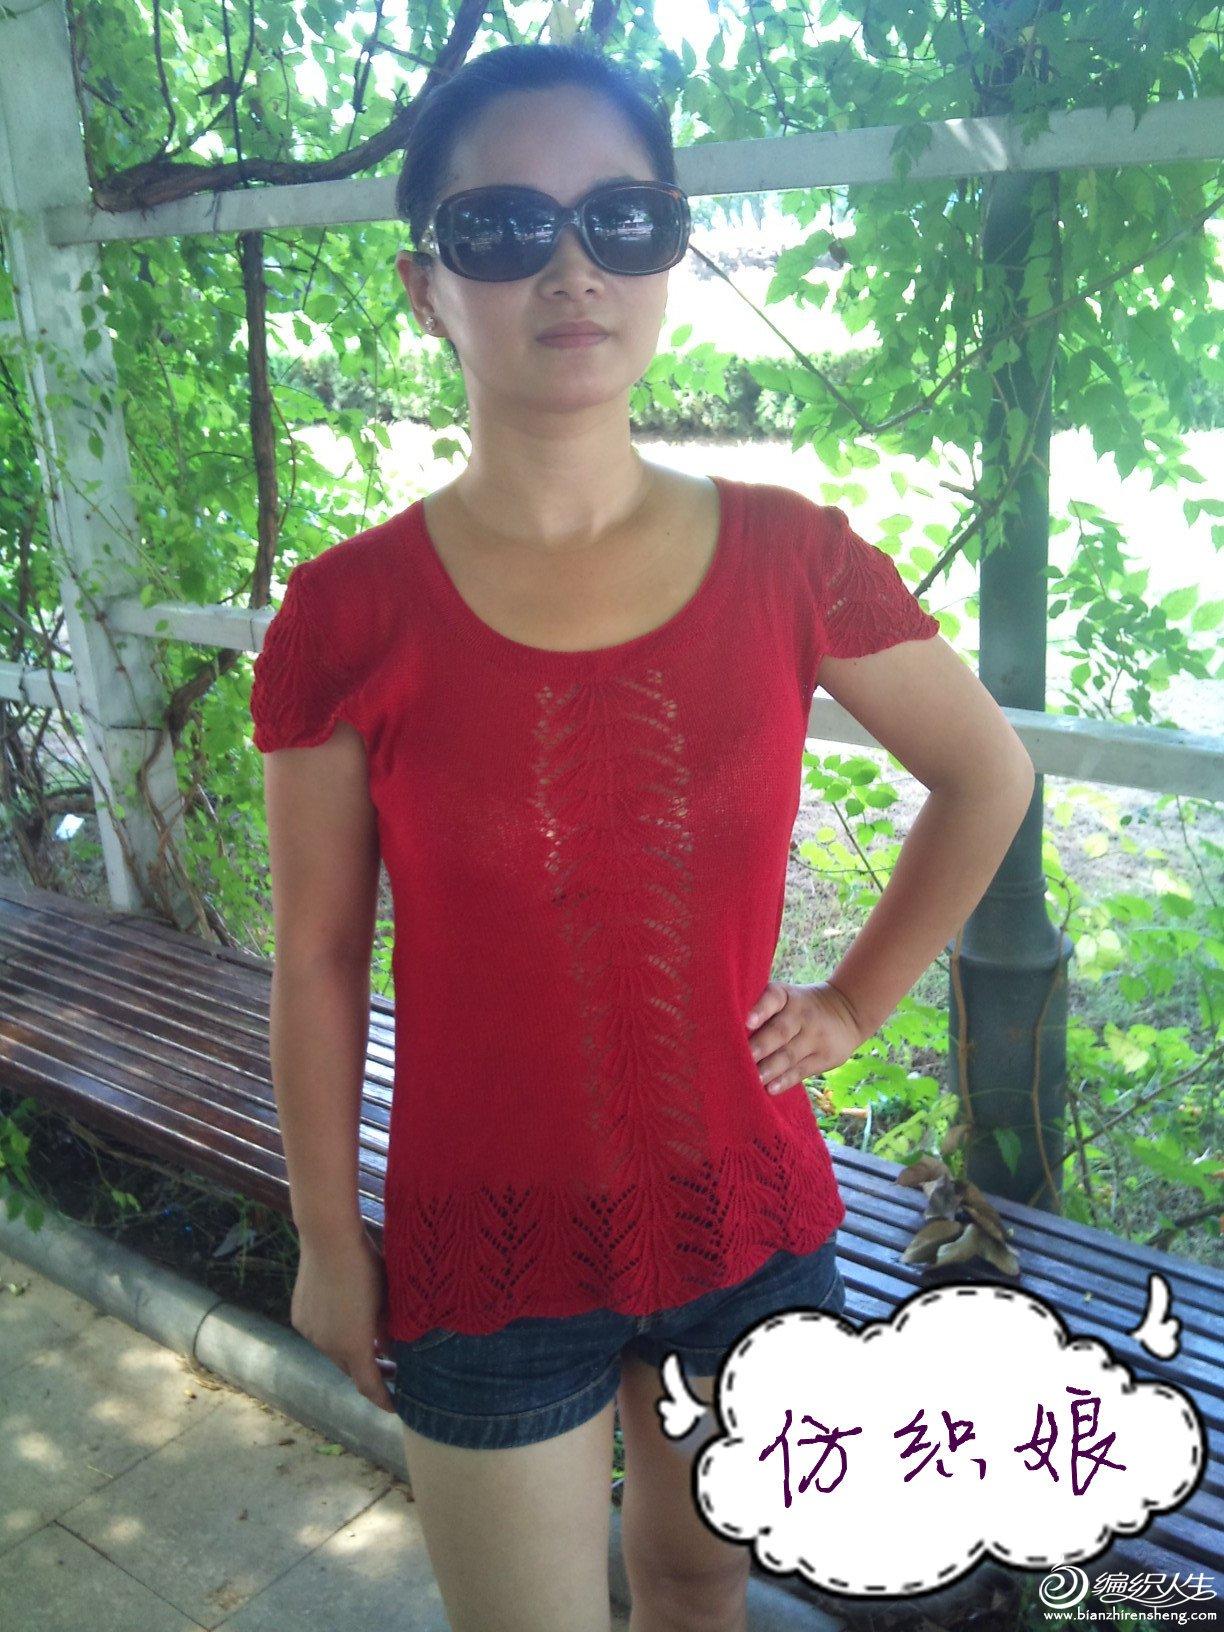 c360_2012-07-23 09-33-51_org_副本.jpg